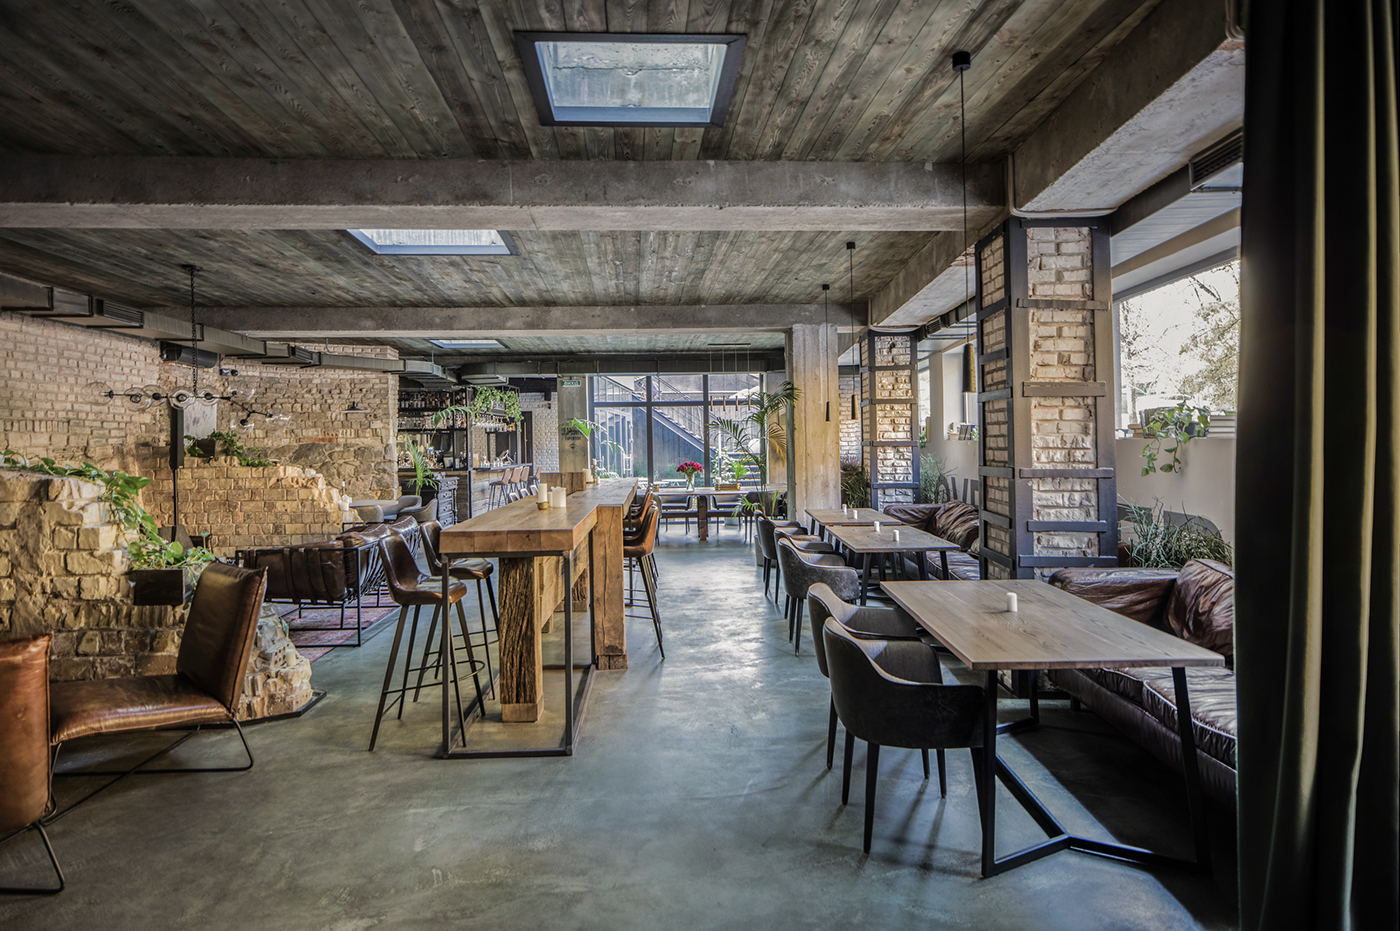 HANGOVER BAR  / restaurant bar, 235 sq. m, Kyiv